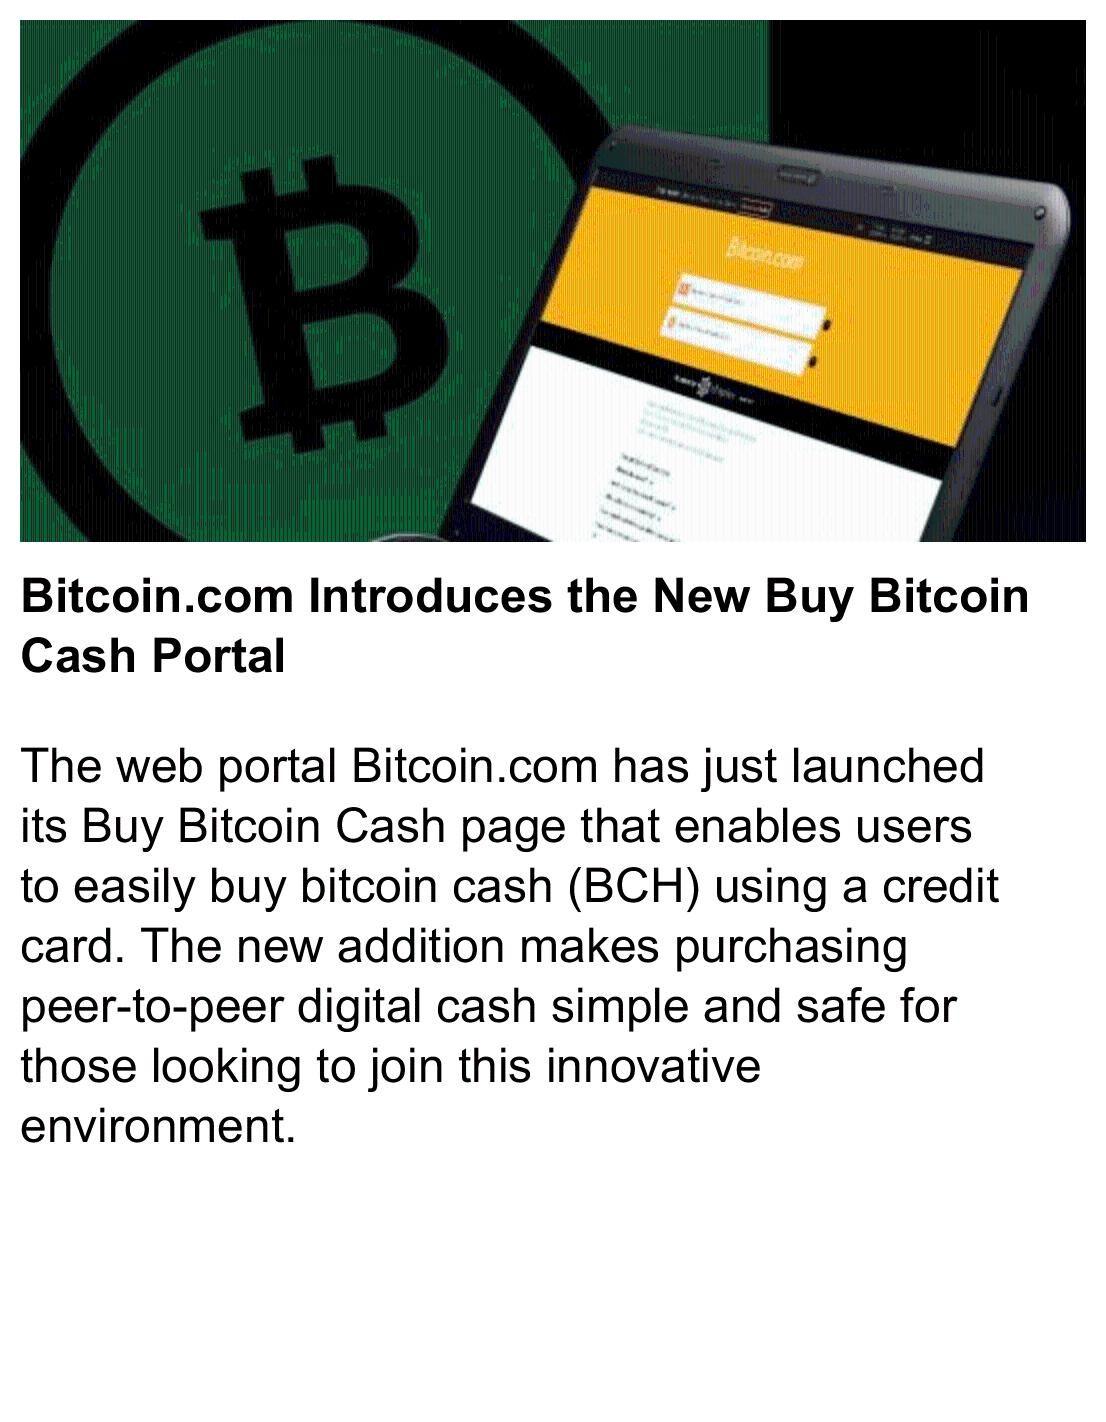 Bitcoin.com Introduces the New Buy Bitcoin Cash Portal # ...